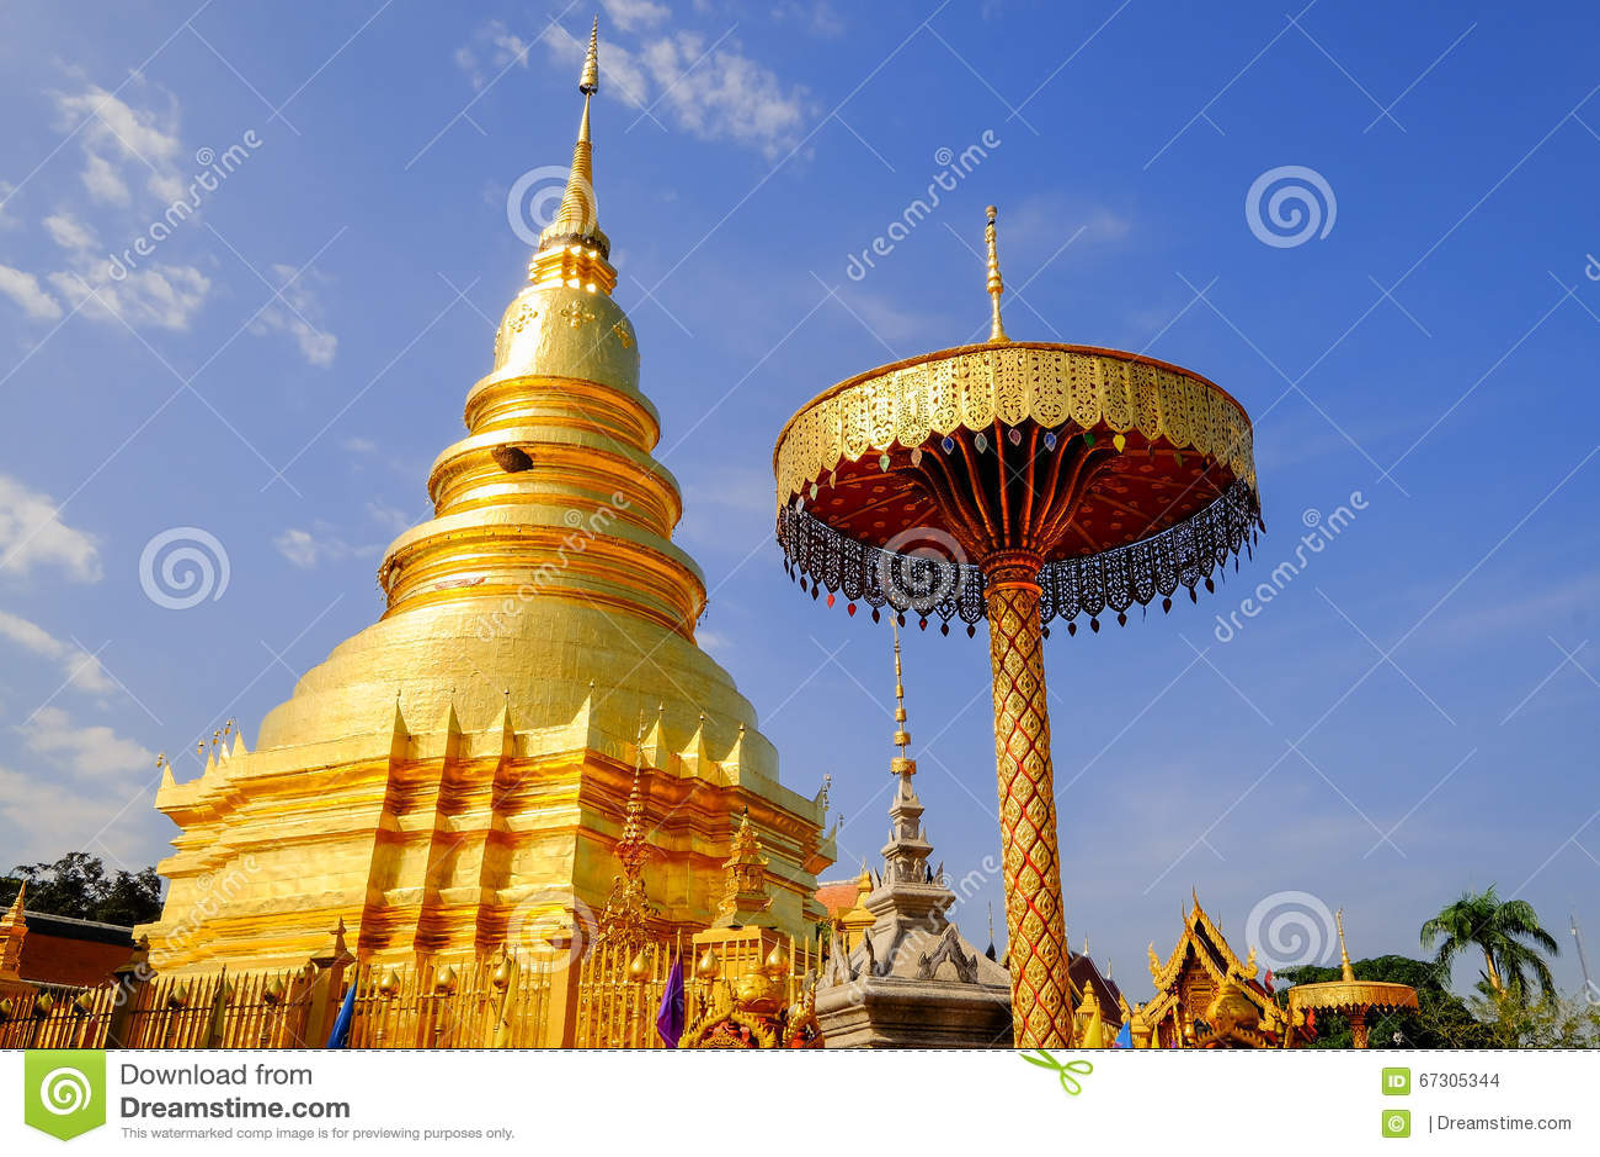 Wat phra das hariphunchai